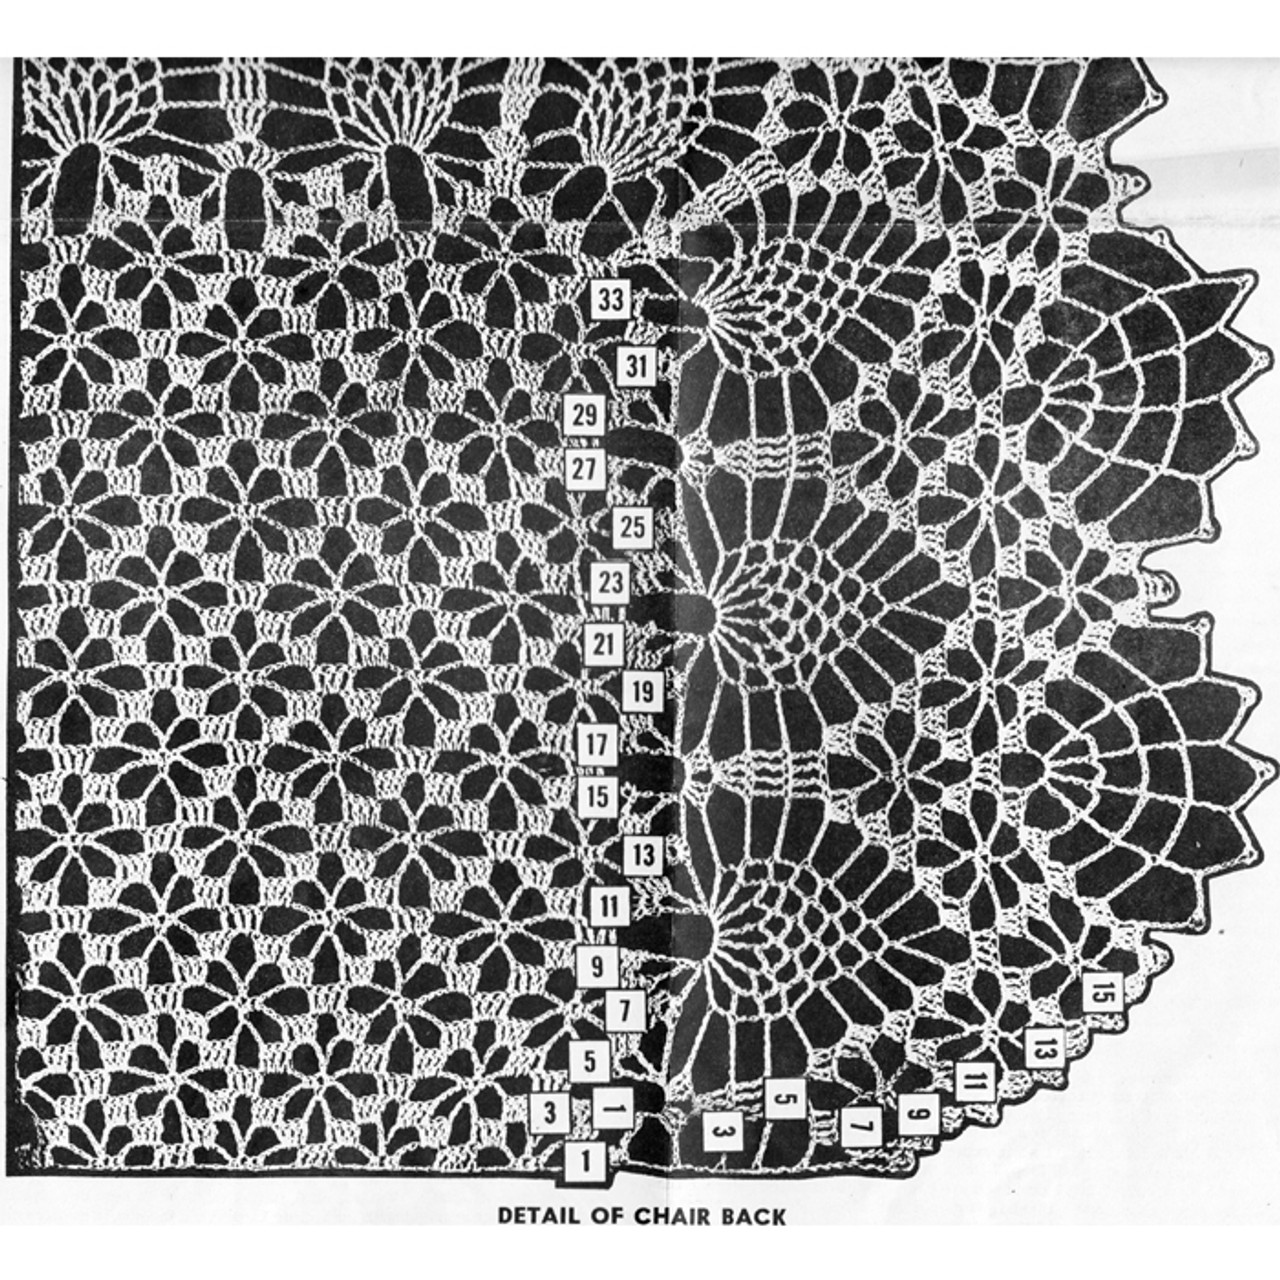 Chair Back Pineapple Mesh Pattern Detail